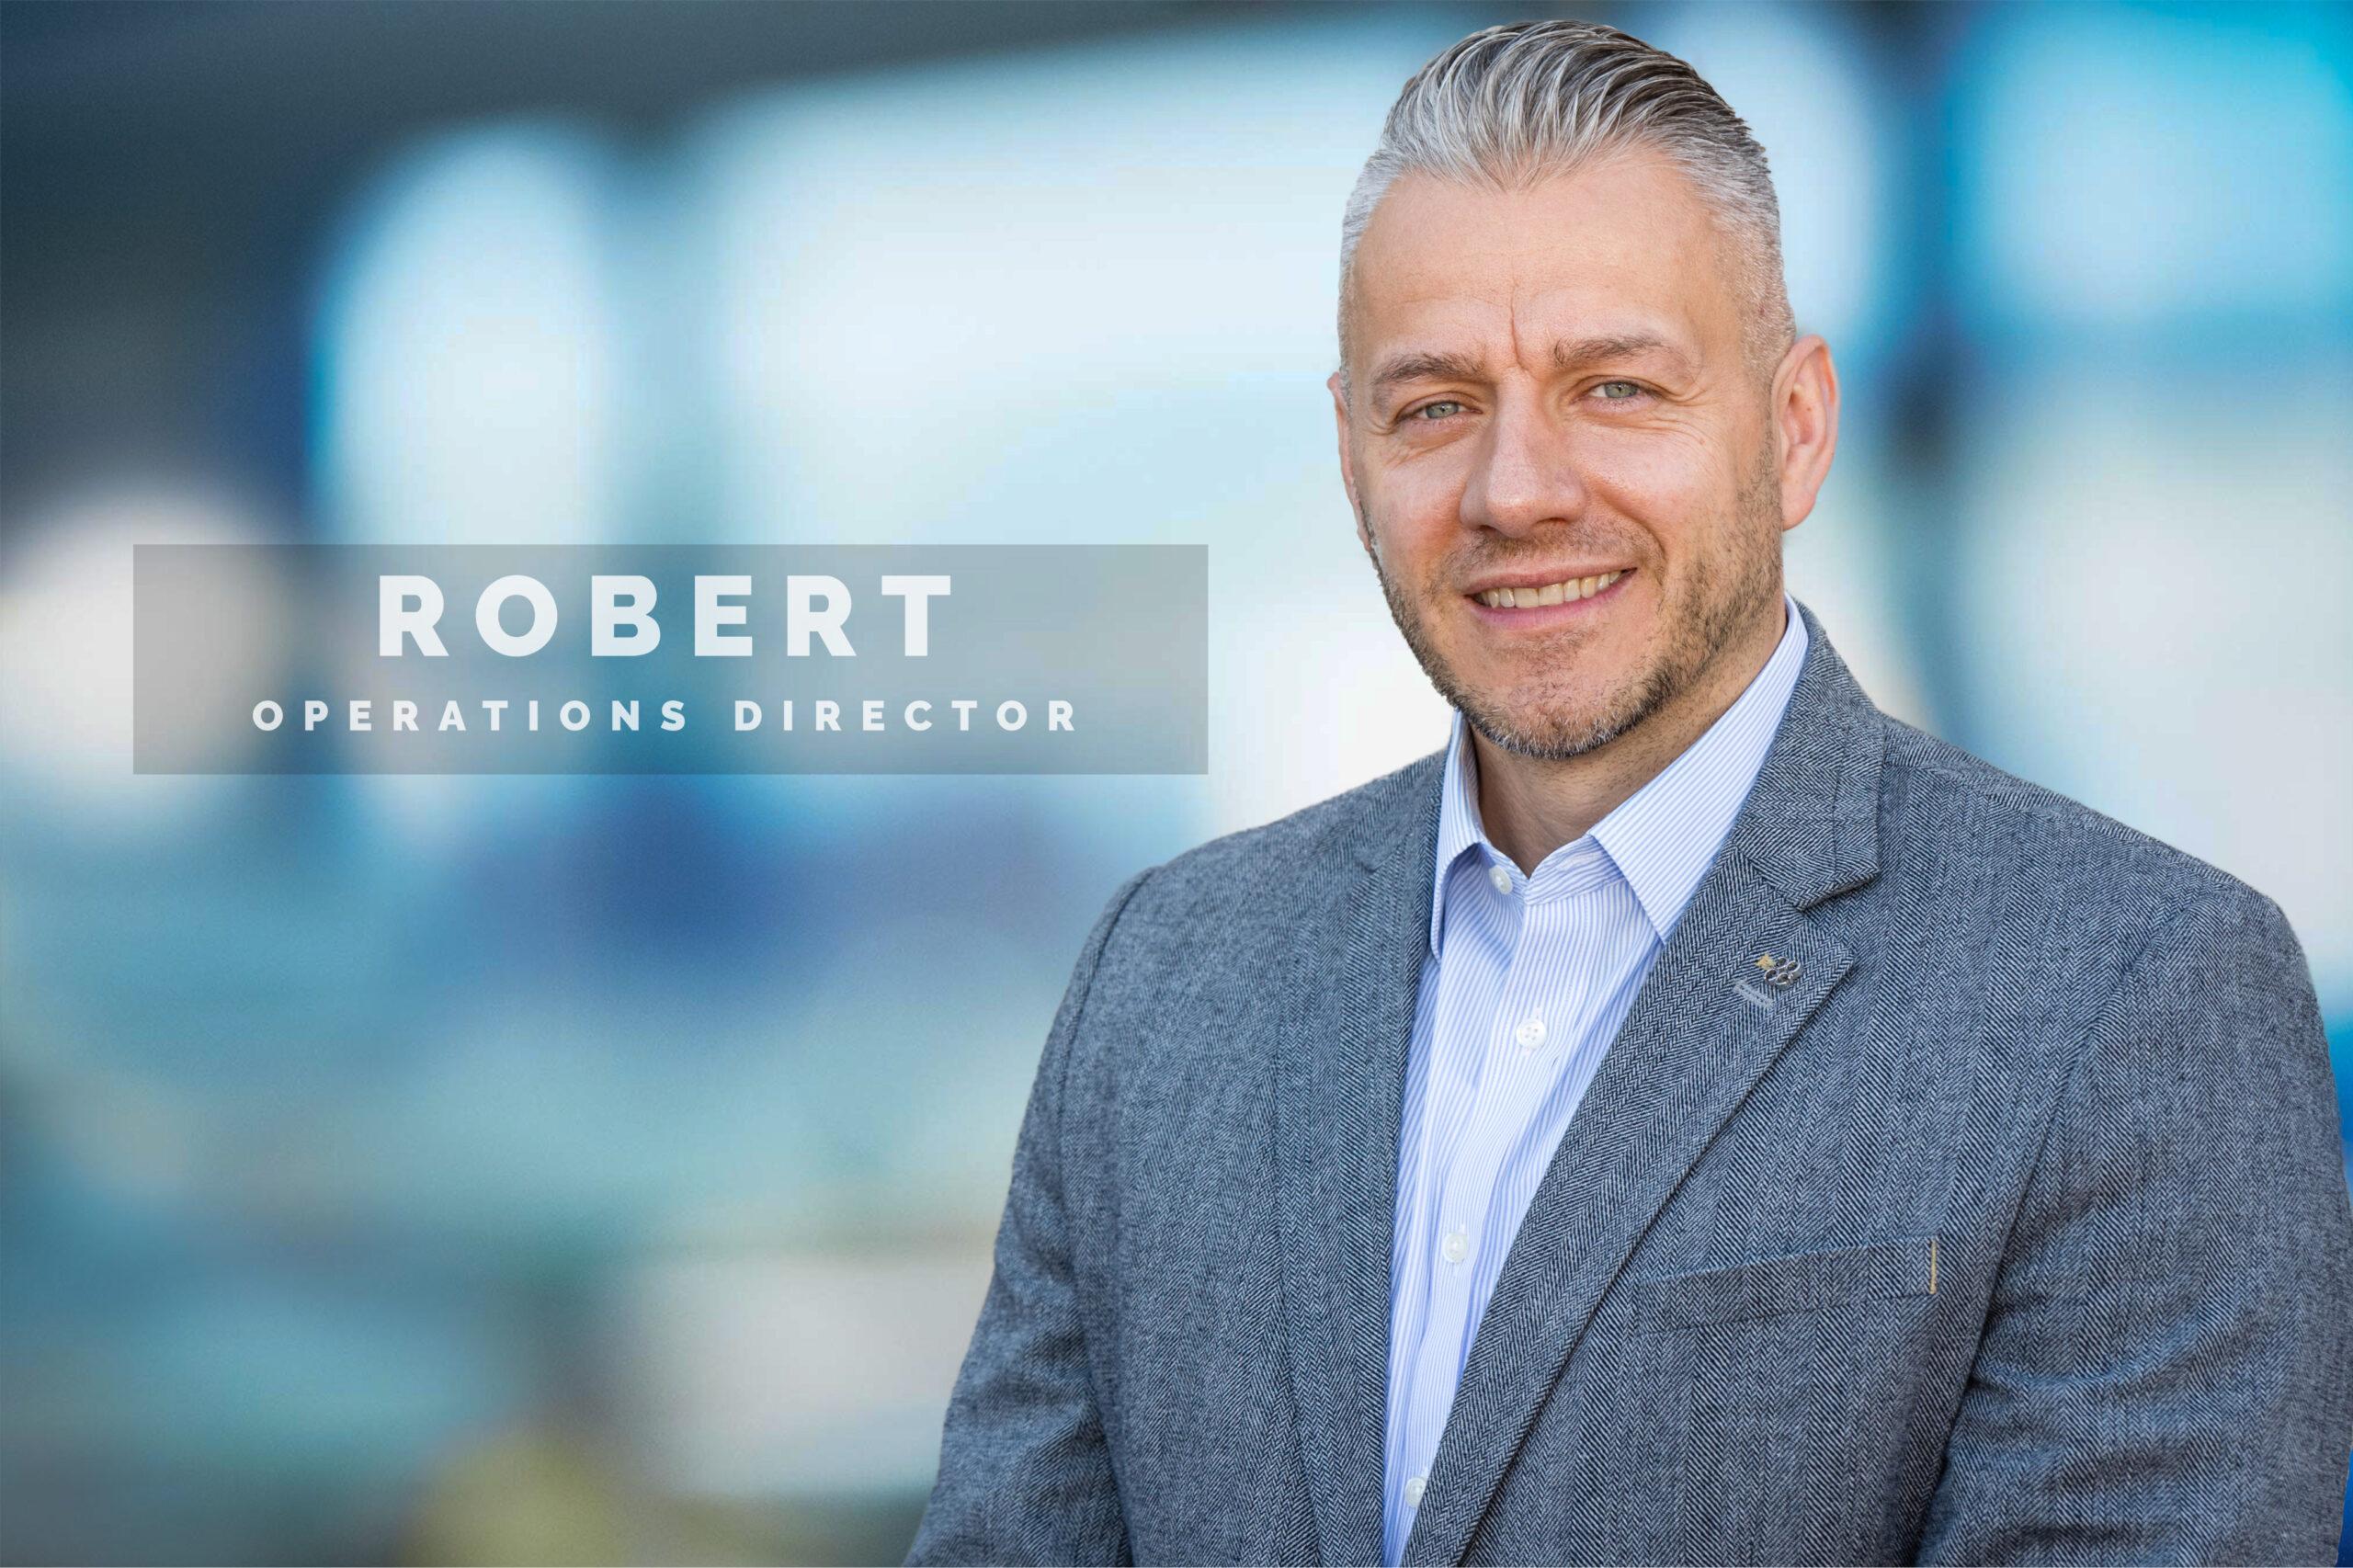 Robert - Operations Director